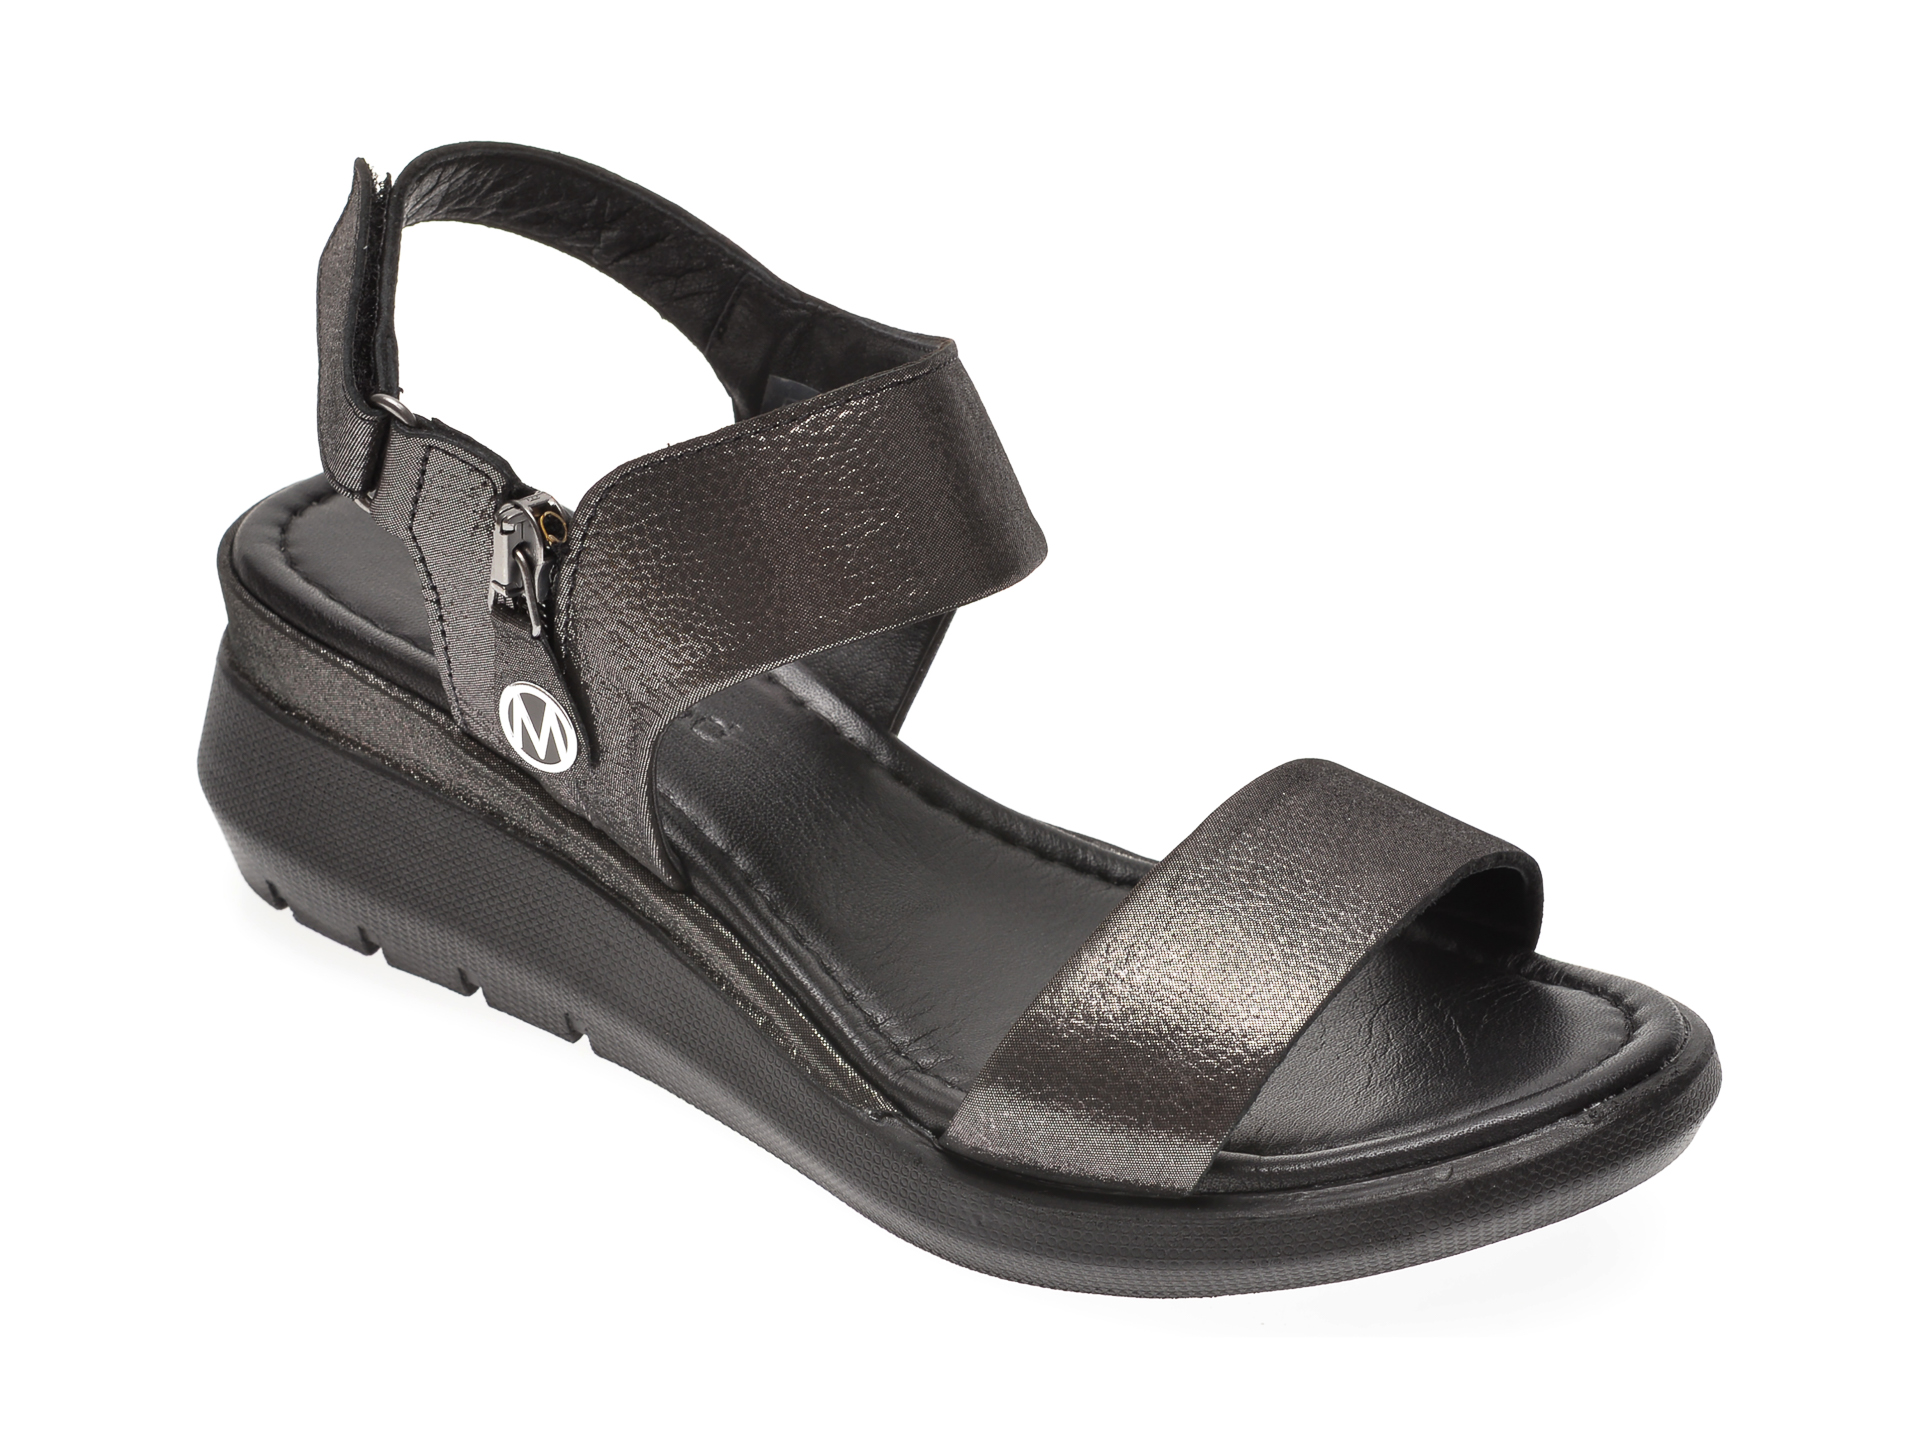 Sandale MESSIMODA negre, 20Y3941, din piele naturala